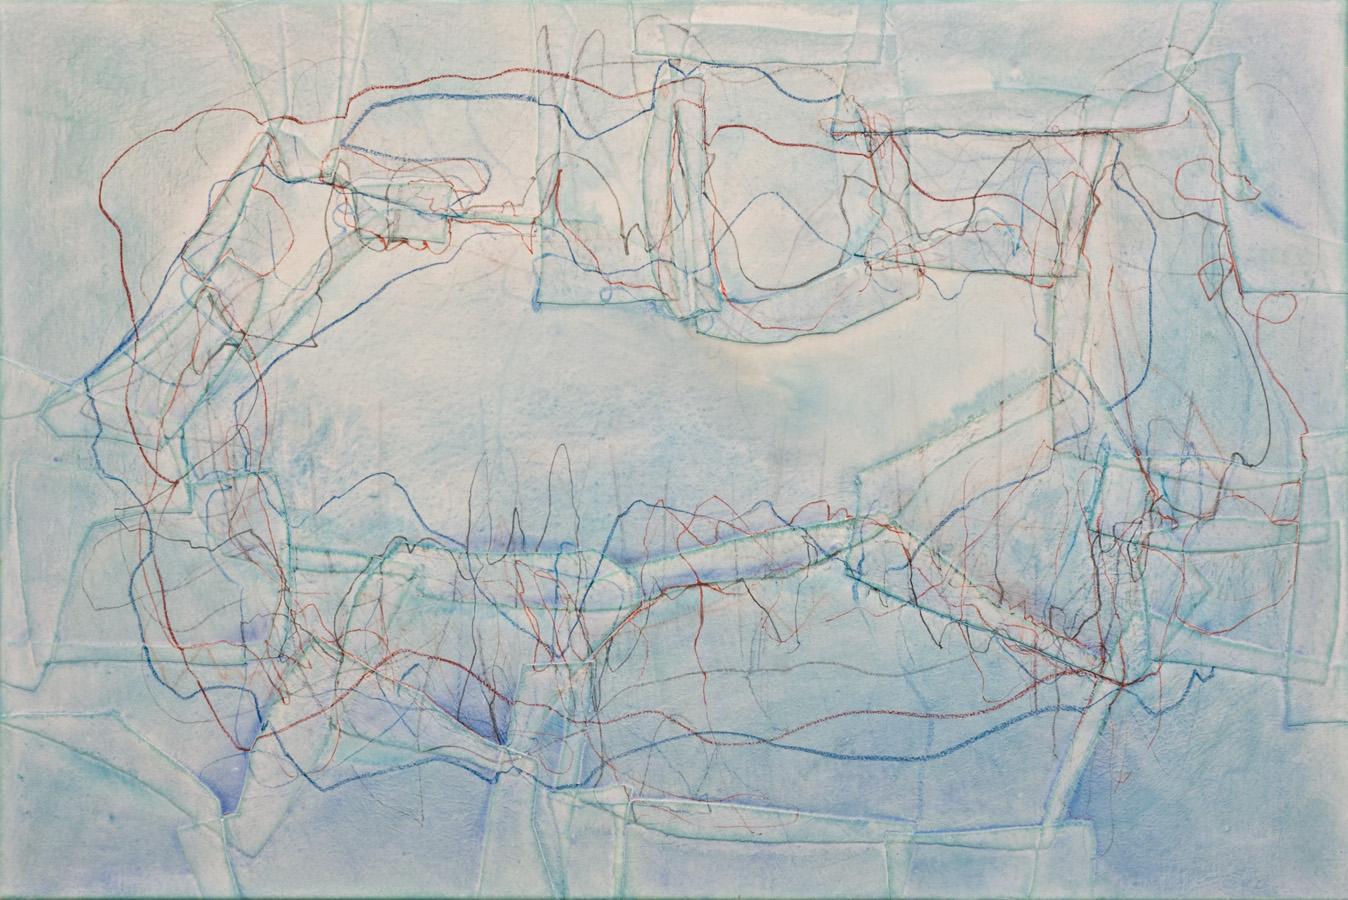 80 x 120 cm mixed media on canvas 2016